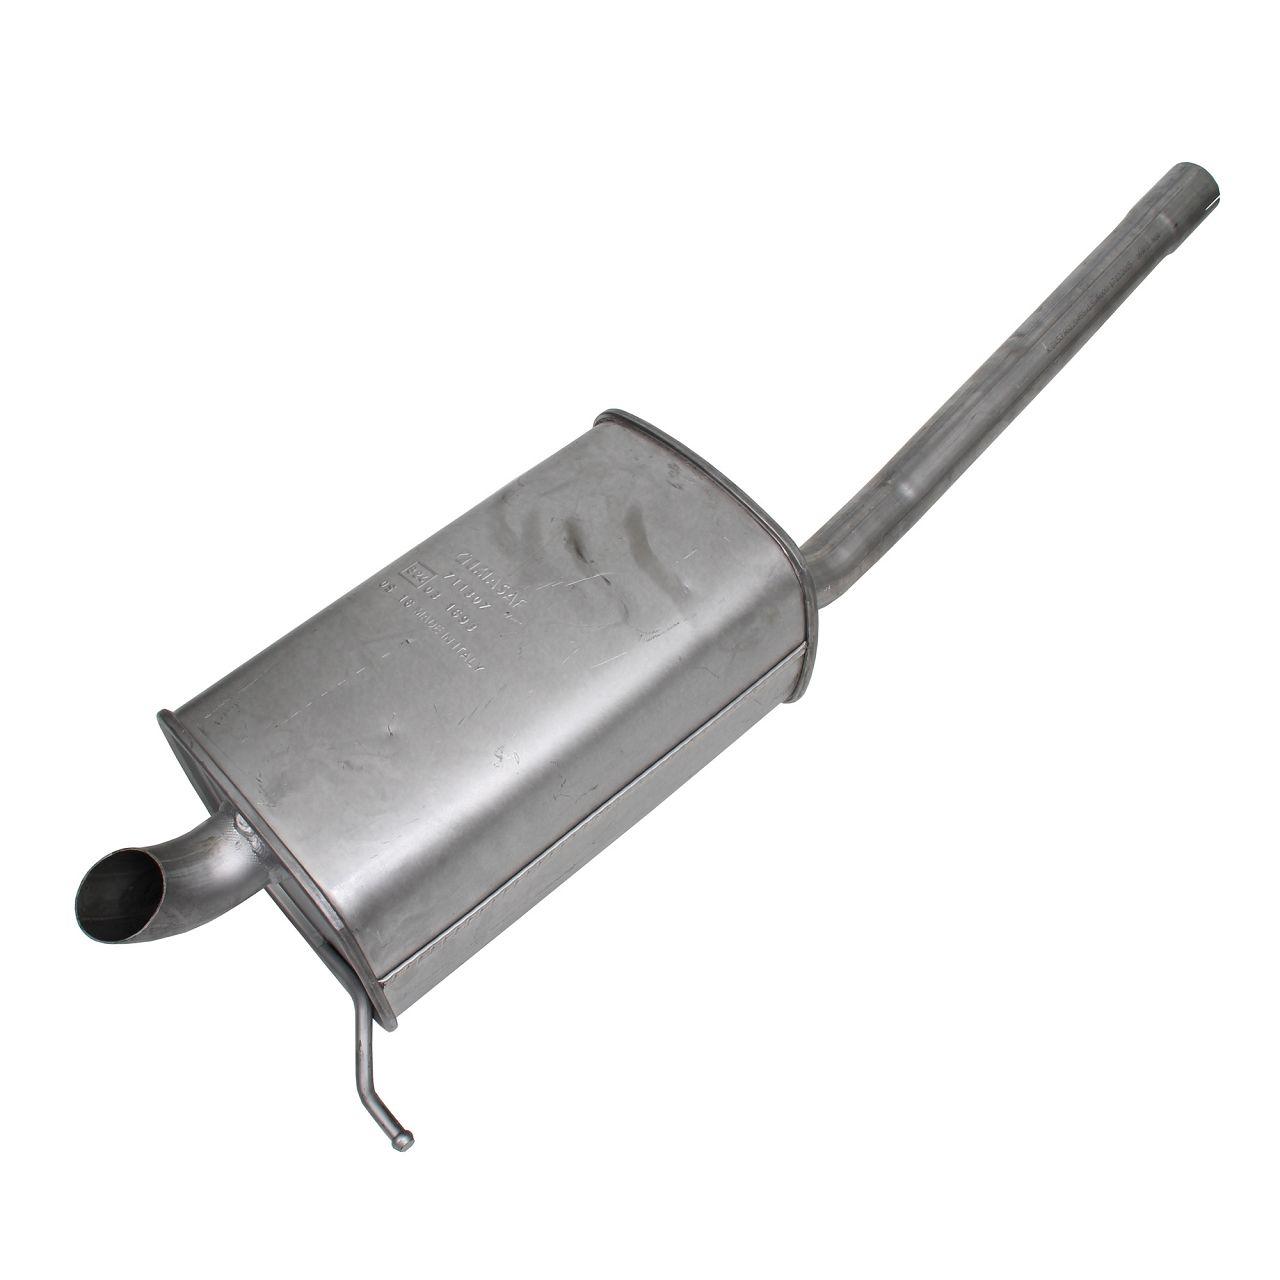 IMASAF Schalldämpfer Endschalldämpfer VW Caddy 3 1.6 TDI 1.9 TDI 2.0 TDI